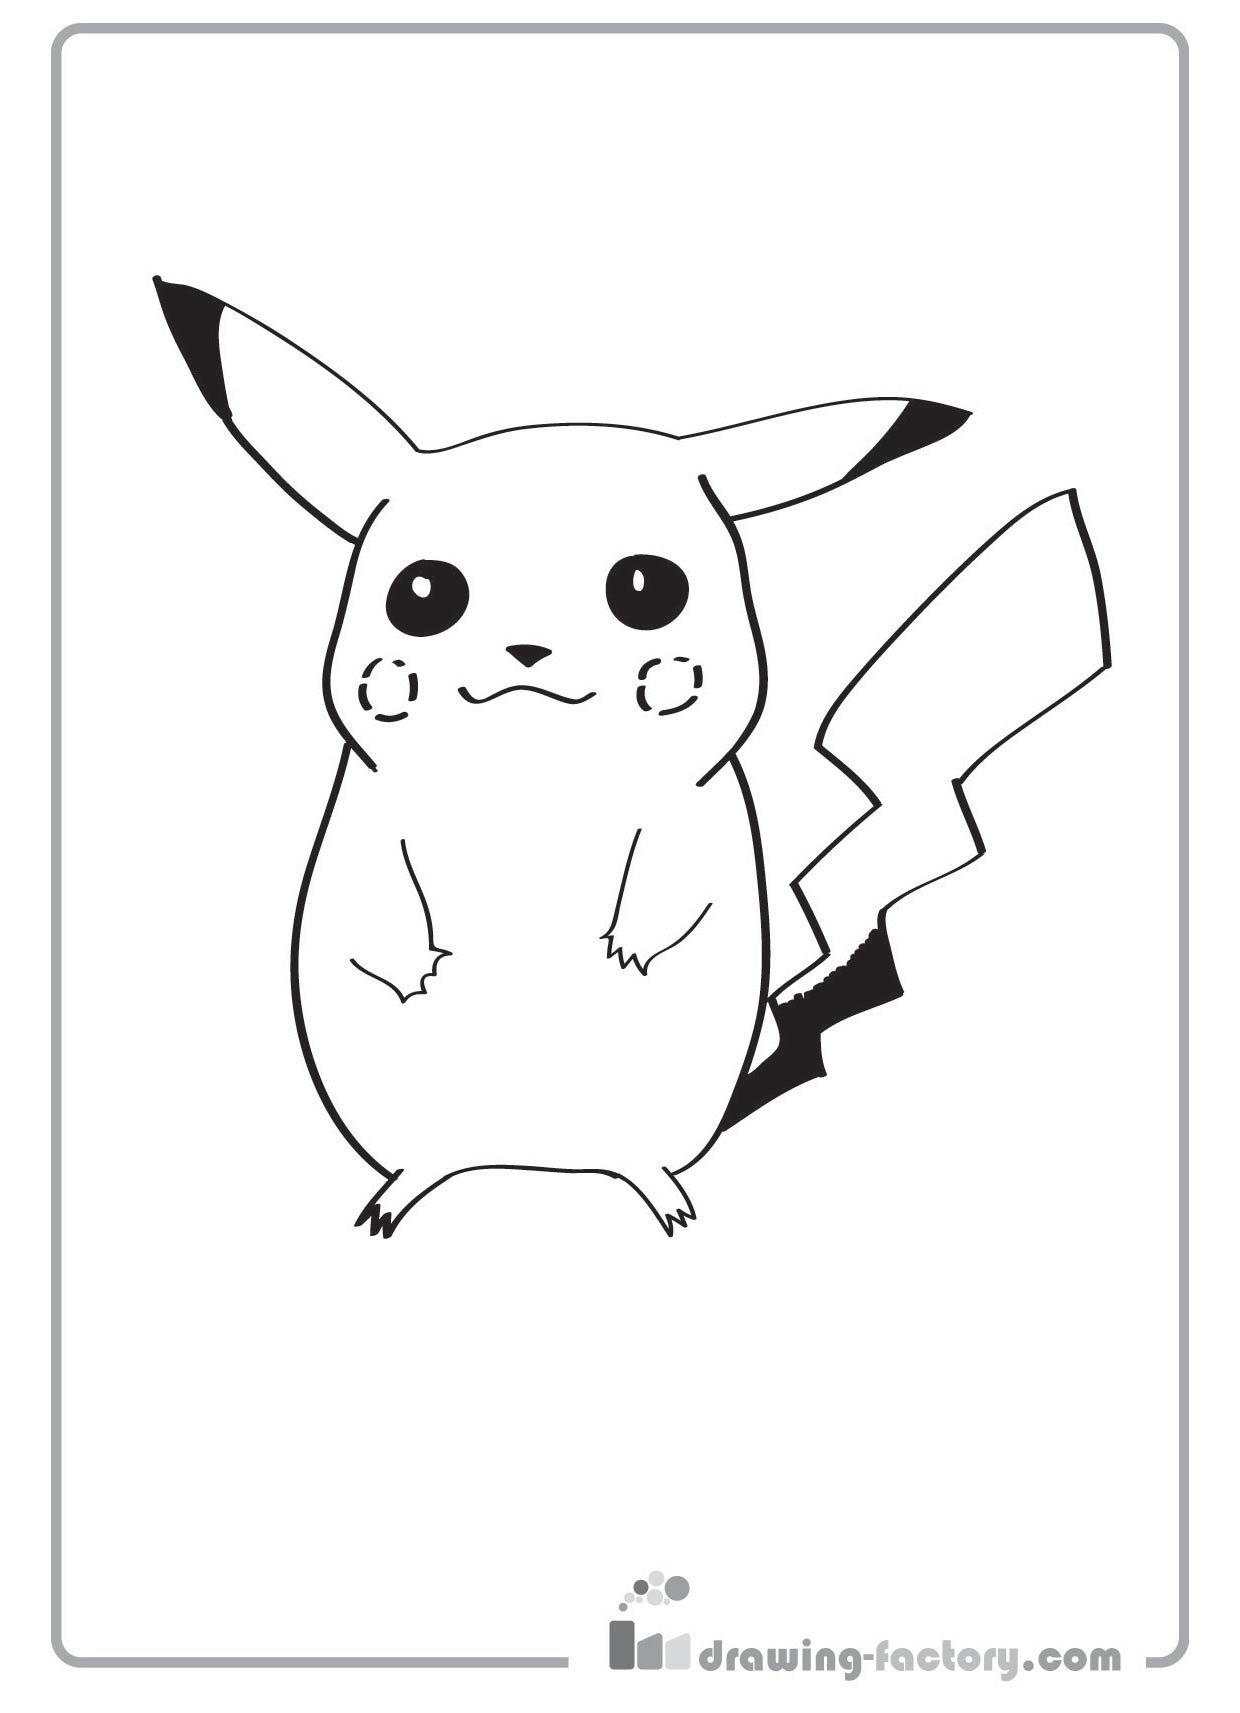 Coloriage pikachu gratuit dessin a imprimer 86